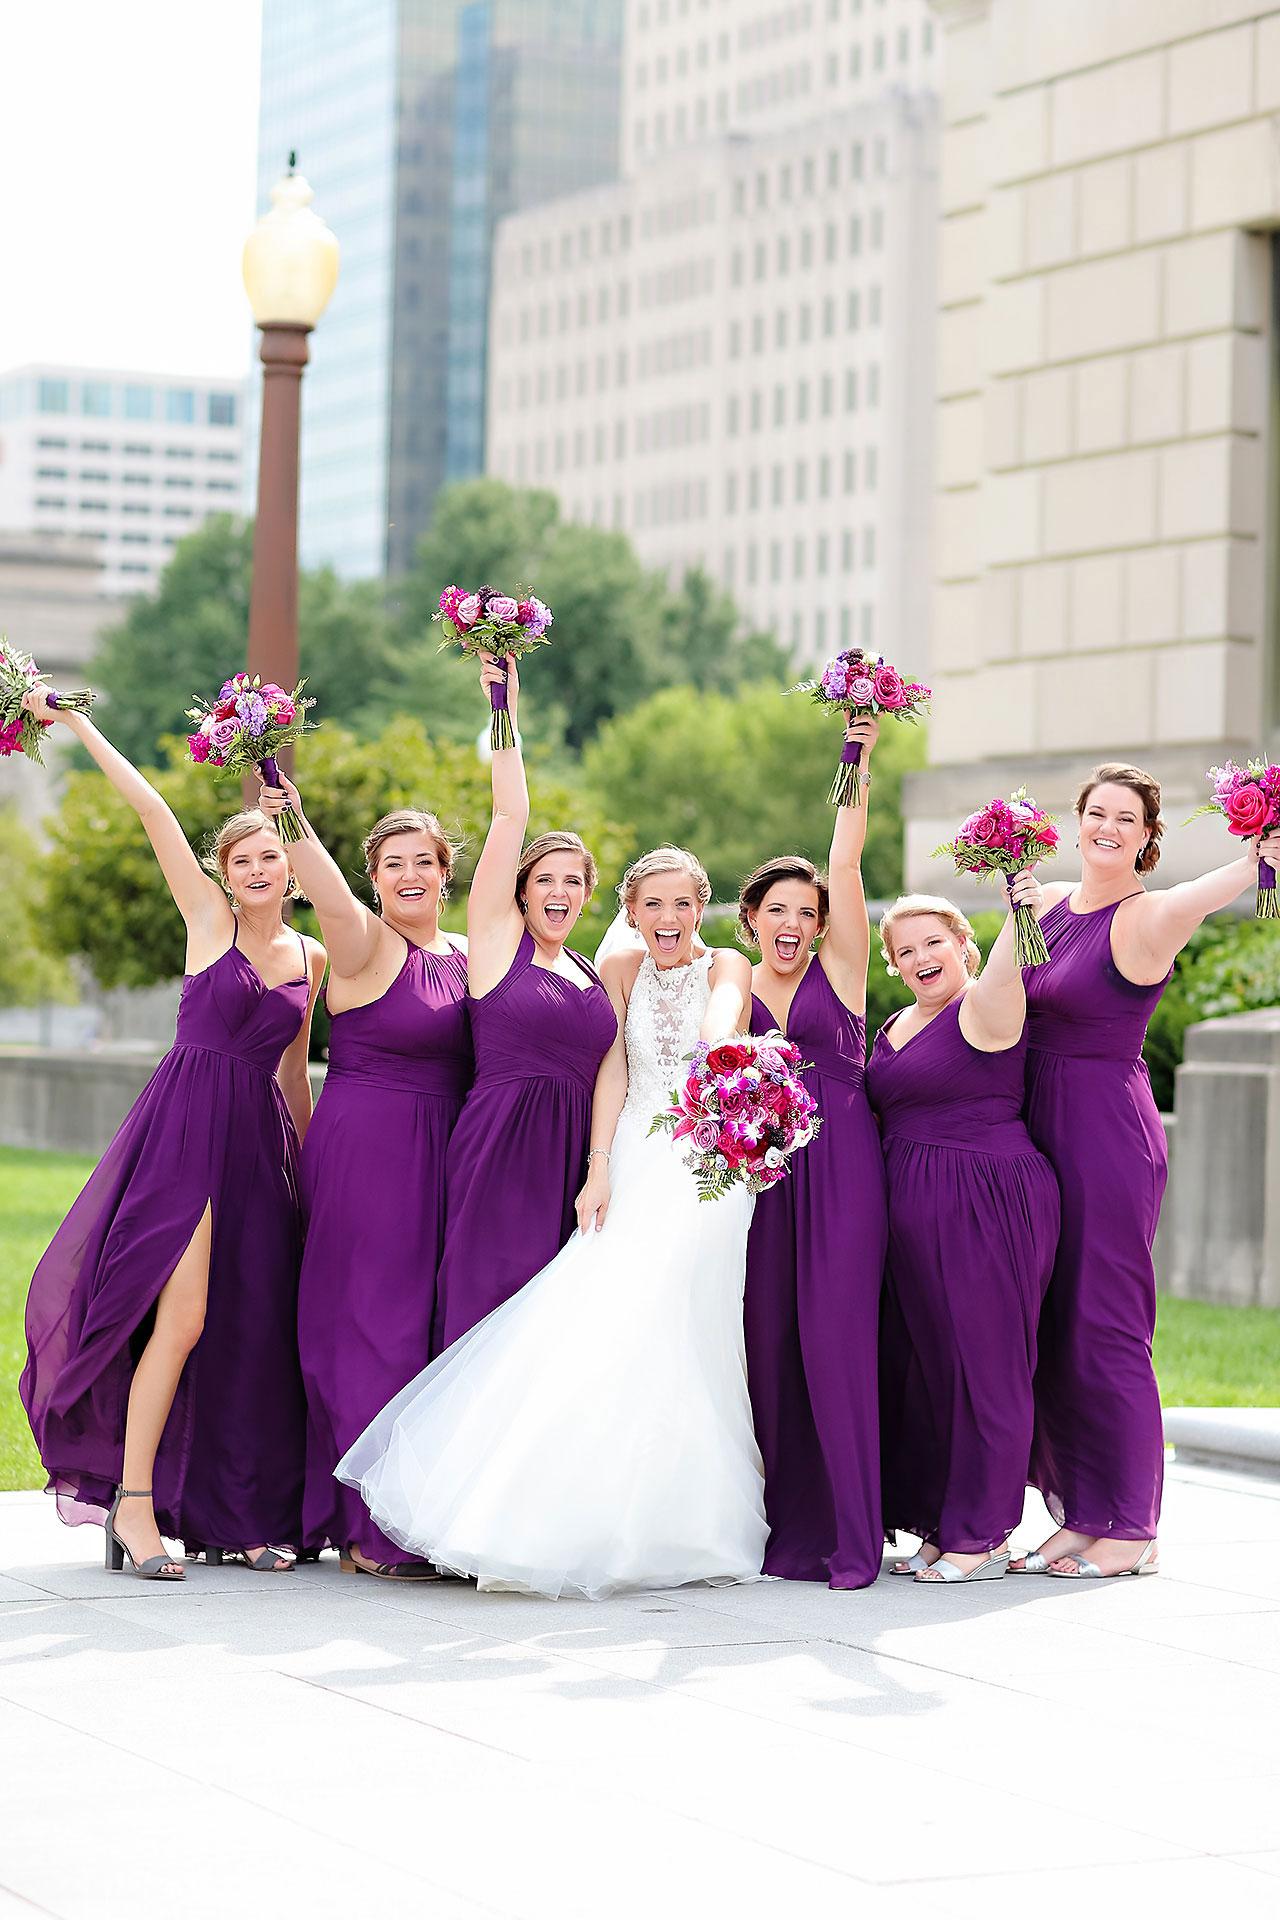 Serra Alex Regions Tower Indianapolis Wedding 101 watermarked